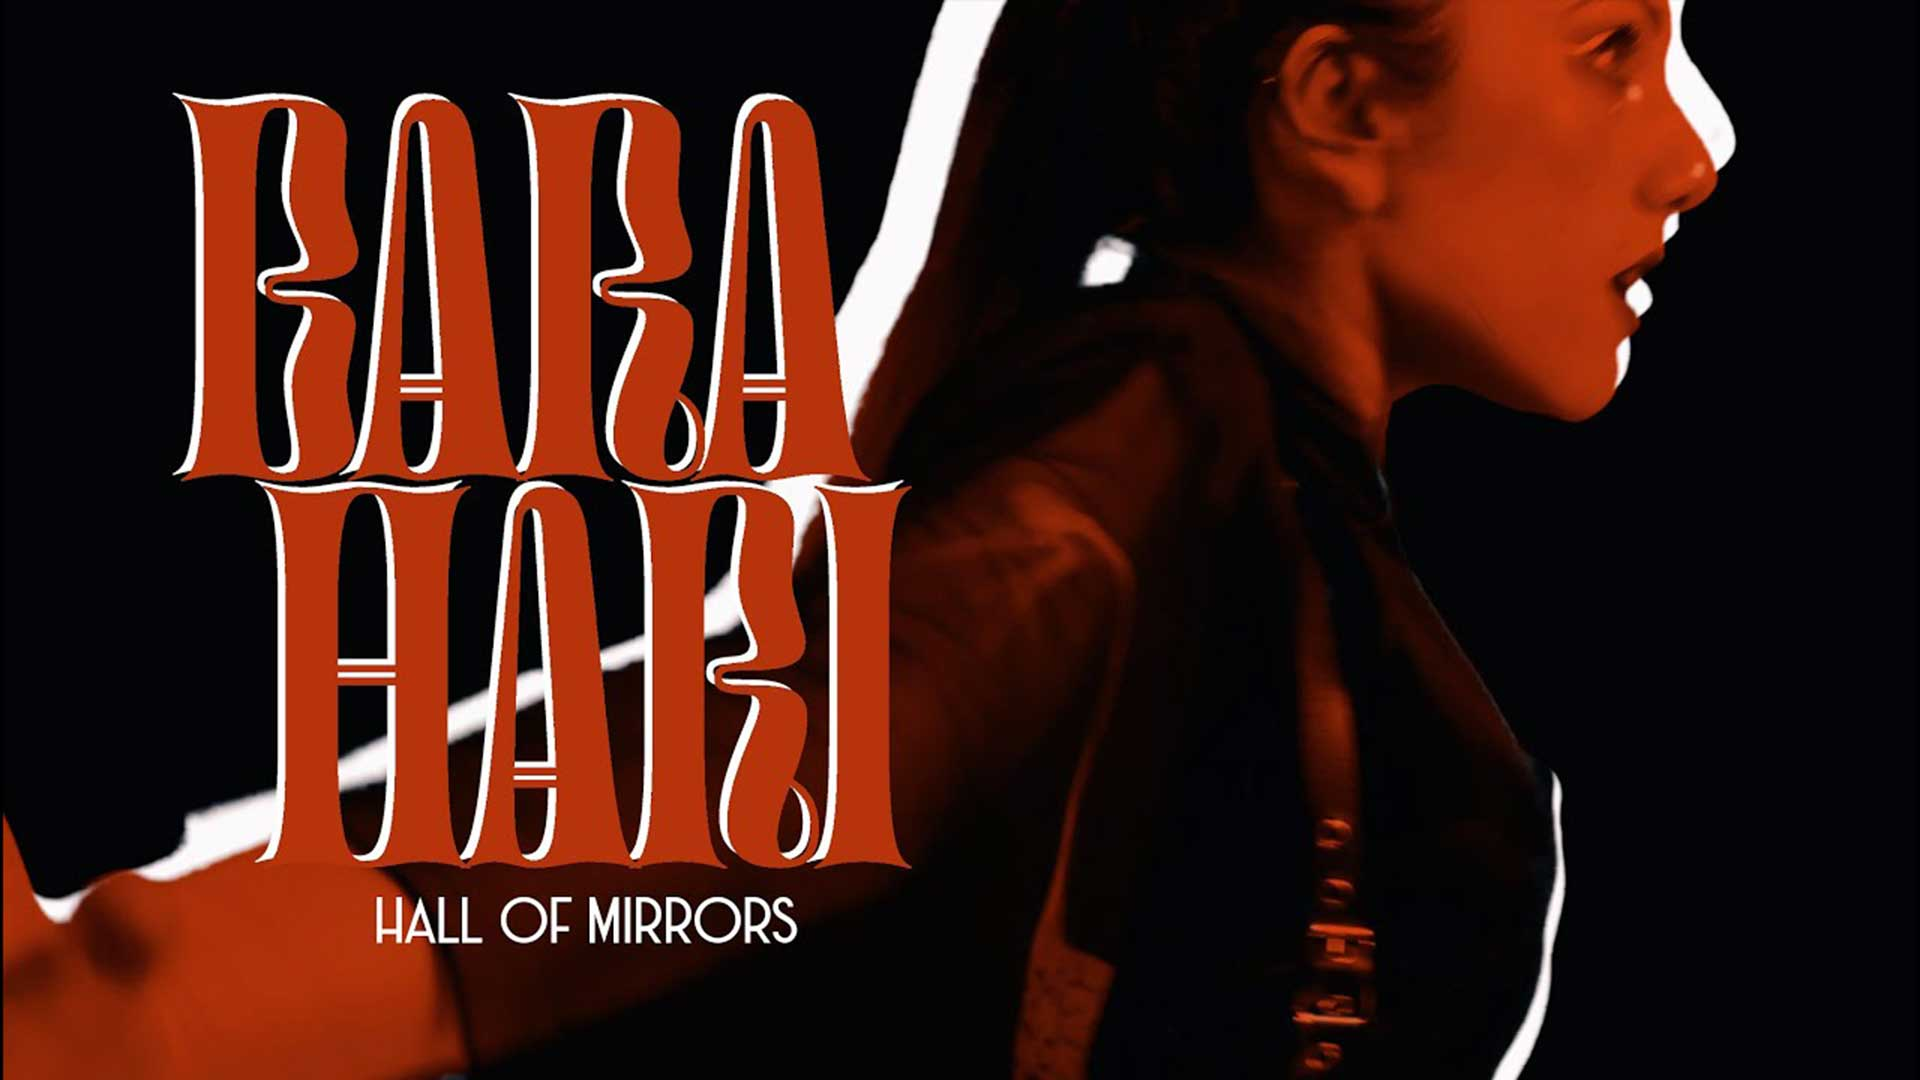 bara hari hall of mirrors